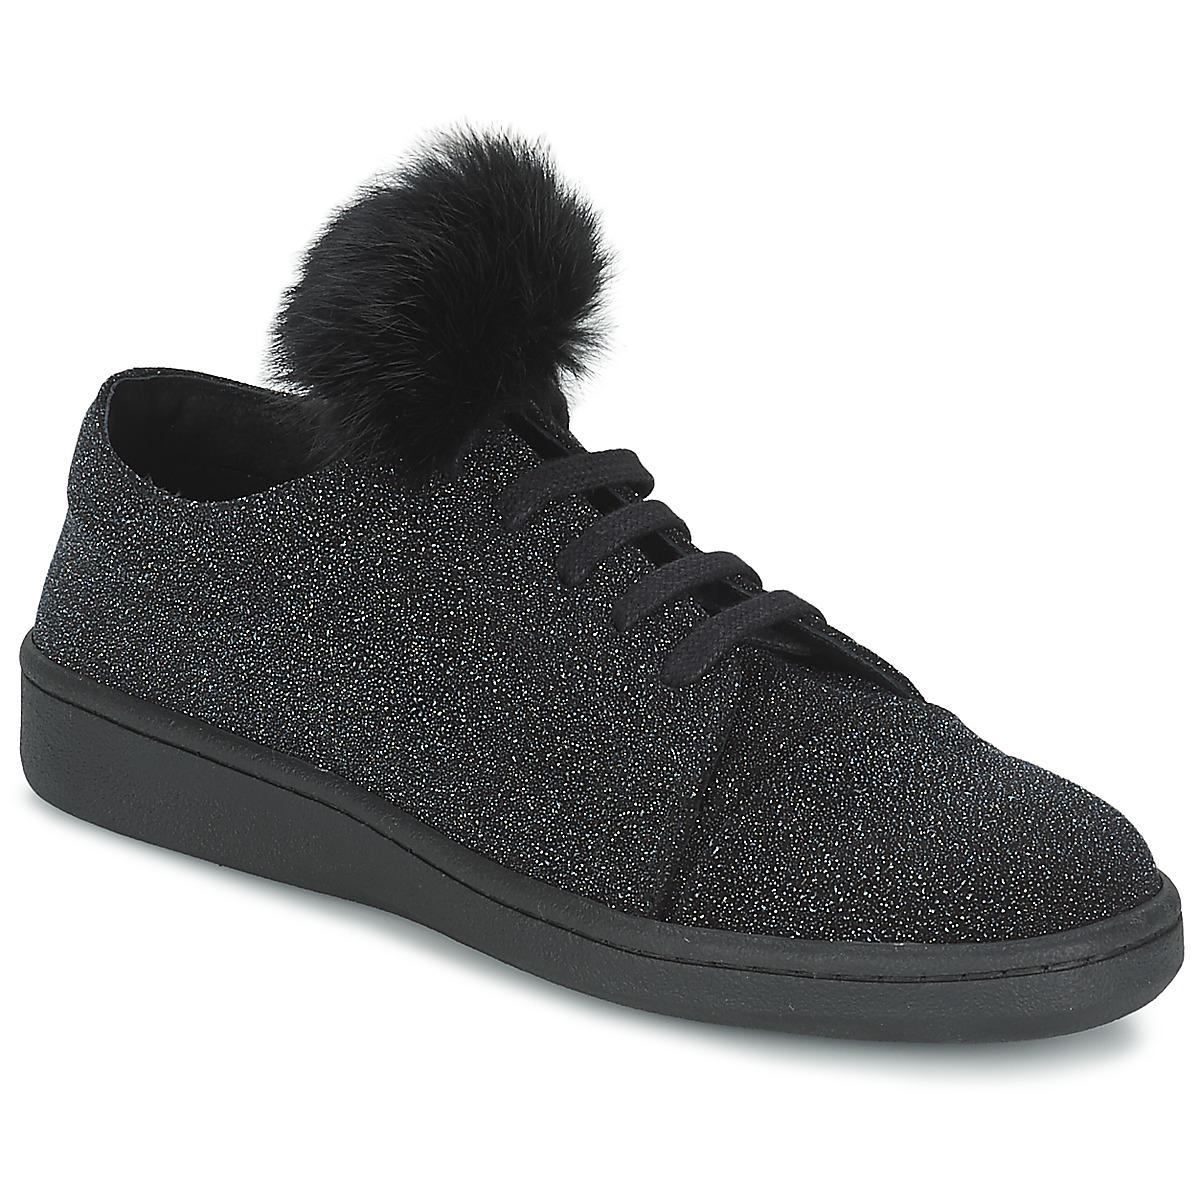 Miista ADALYN Blau - Kostenloser Versand bei Spartoode ! - Schuhe Sneaker Low Damen 98,00 €